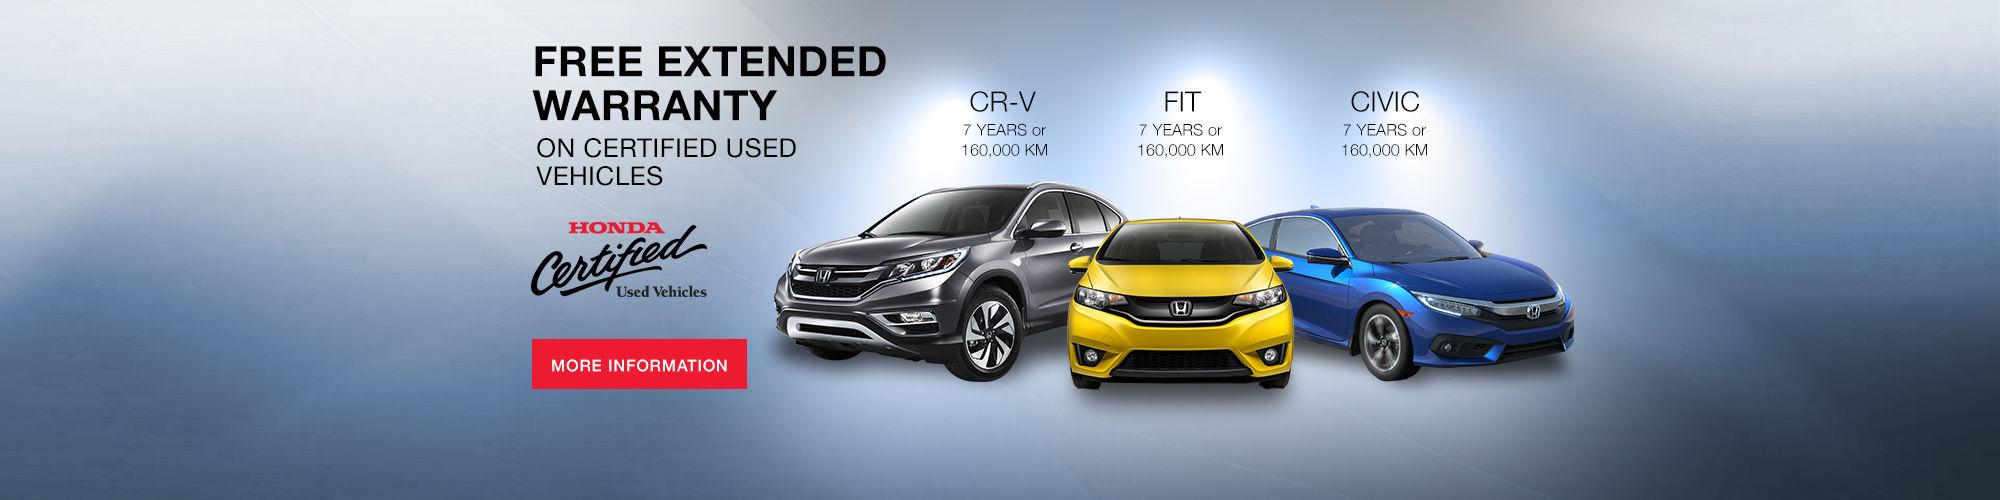 Honda - extended warranty